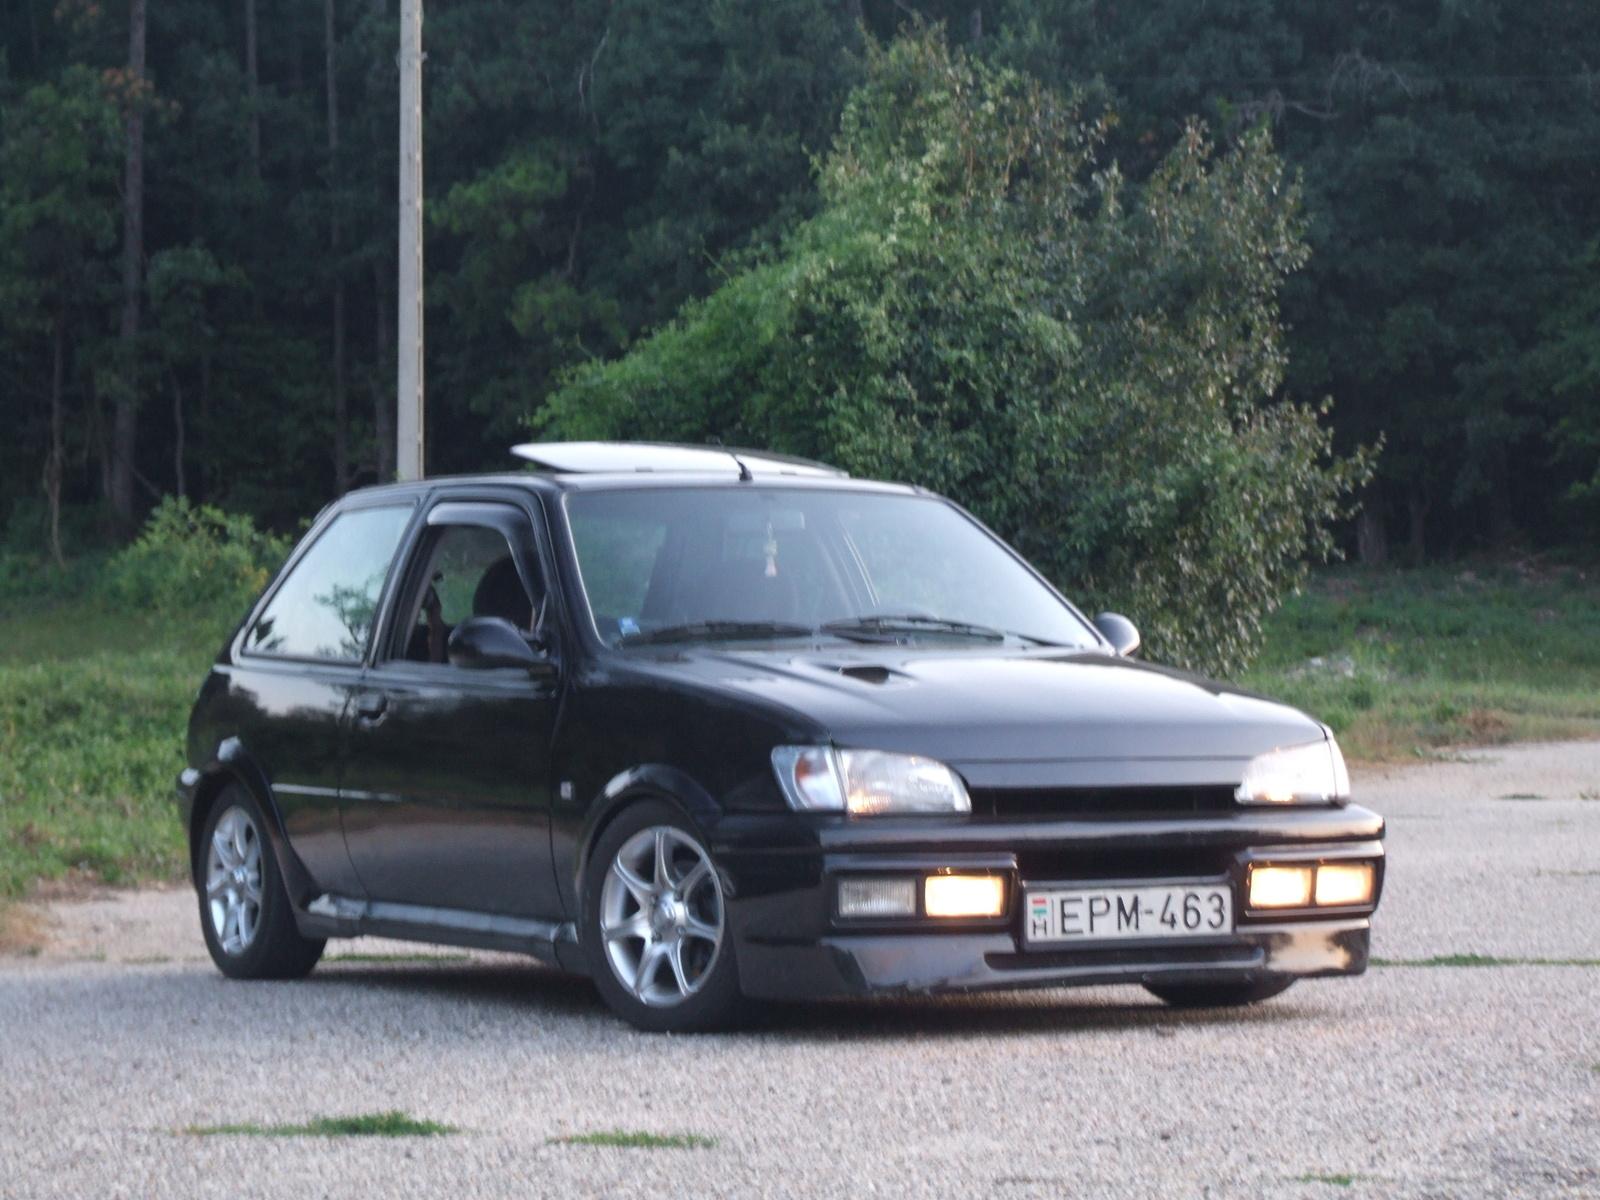 1990 Ford Fiesta Pictures Cargurus